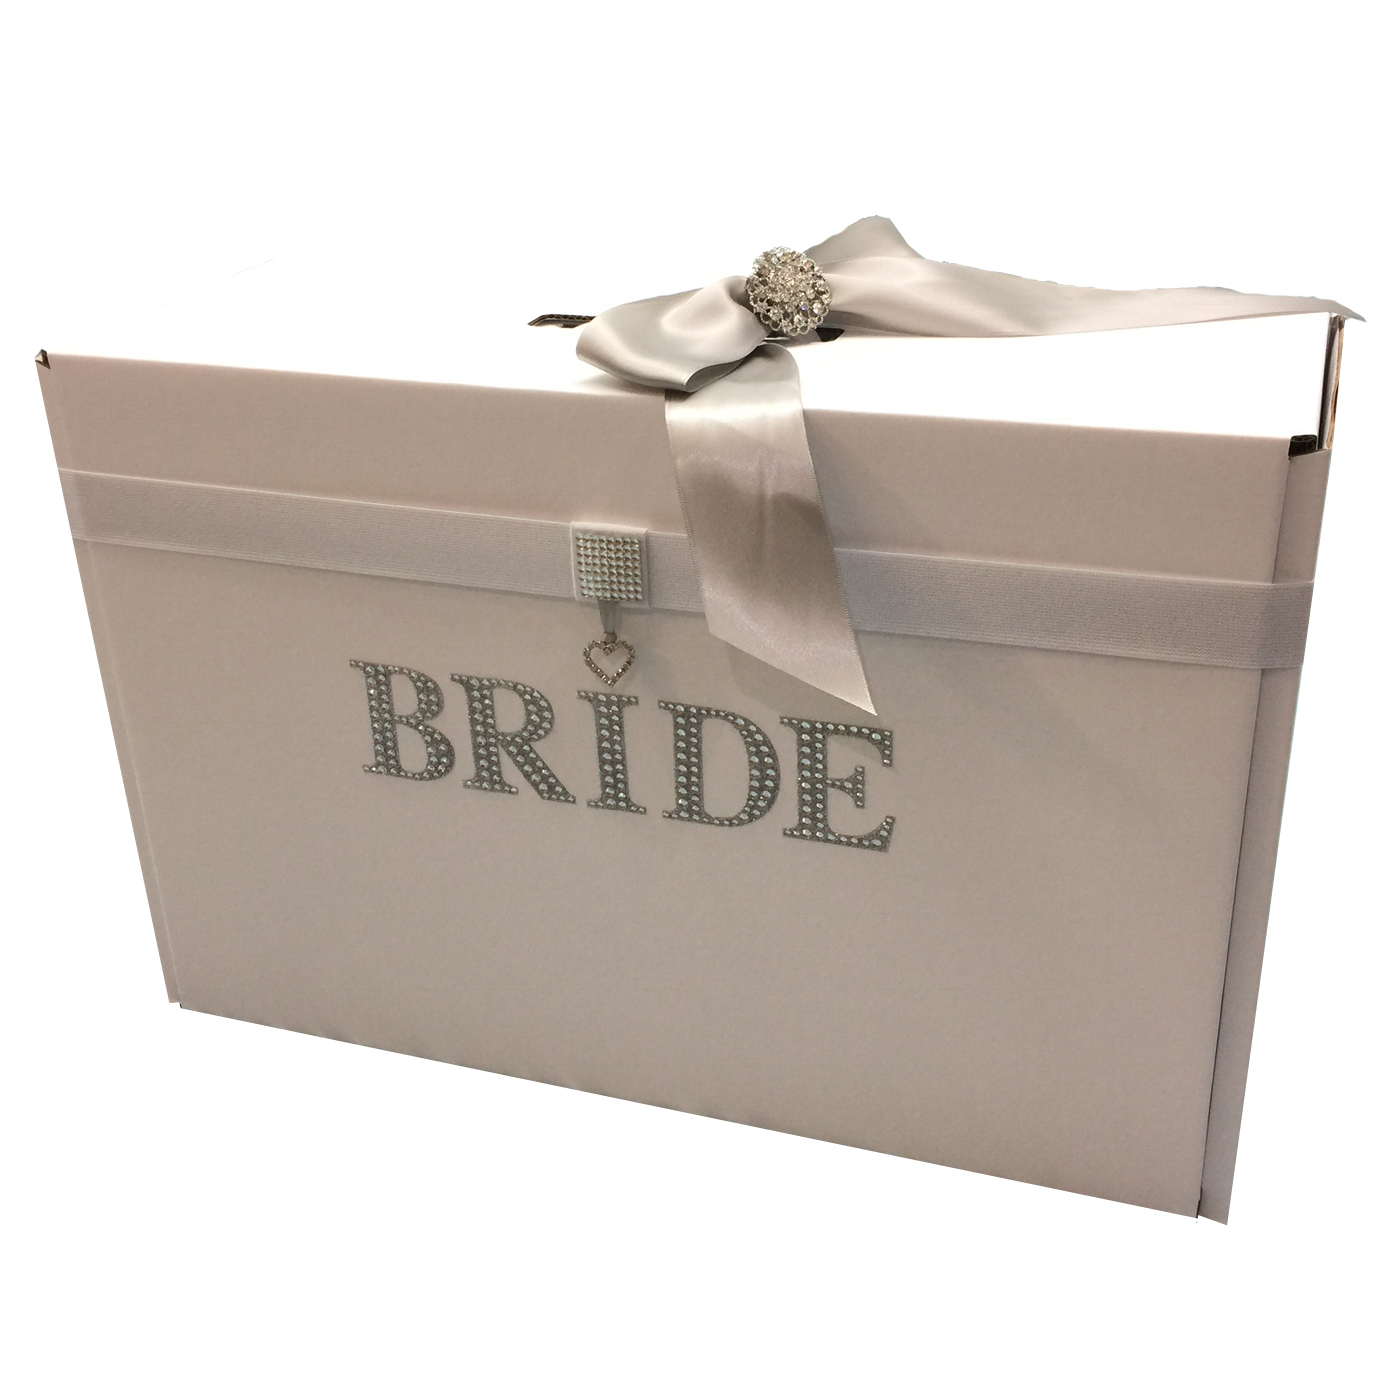 Brides Box: Bride Show Stopper Travel Box